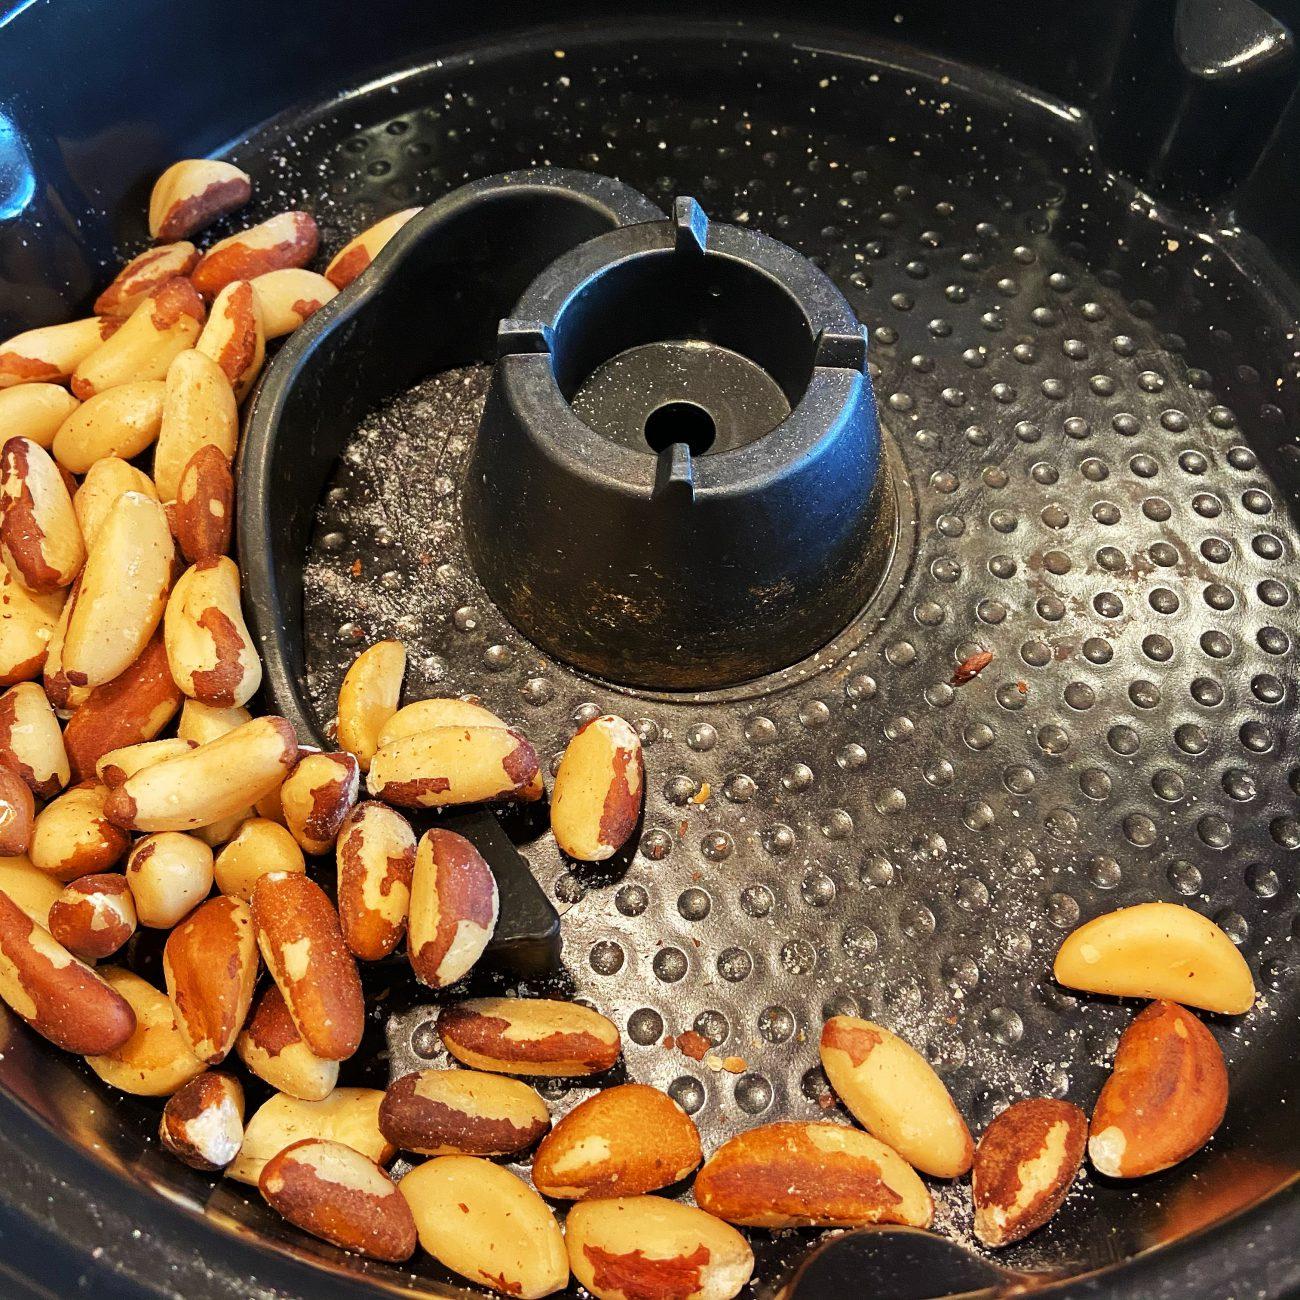 Keto Friendly Dry Roast Brazil Nuts